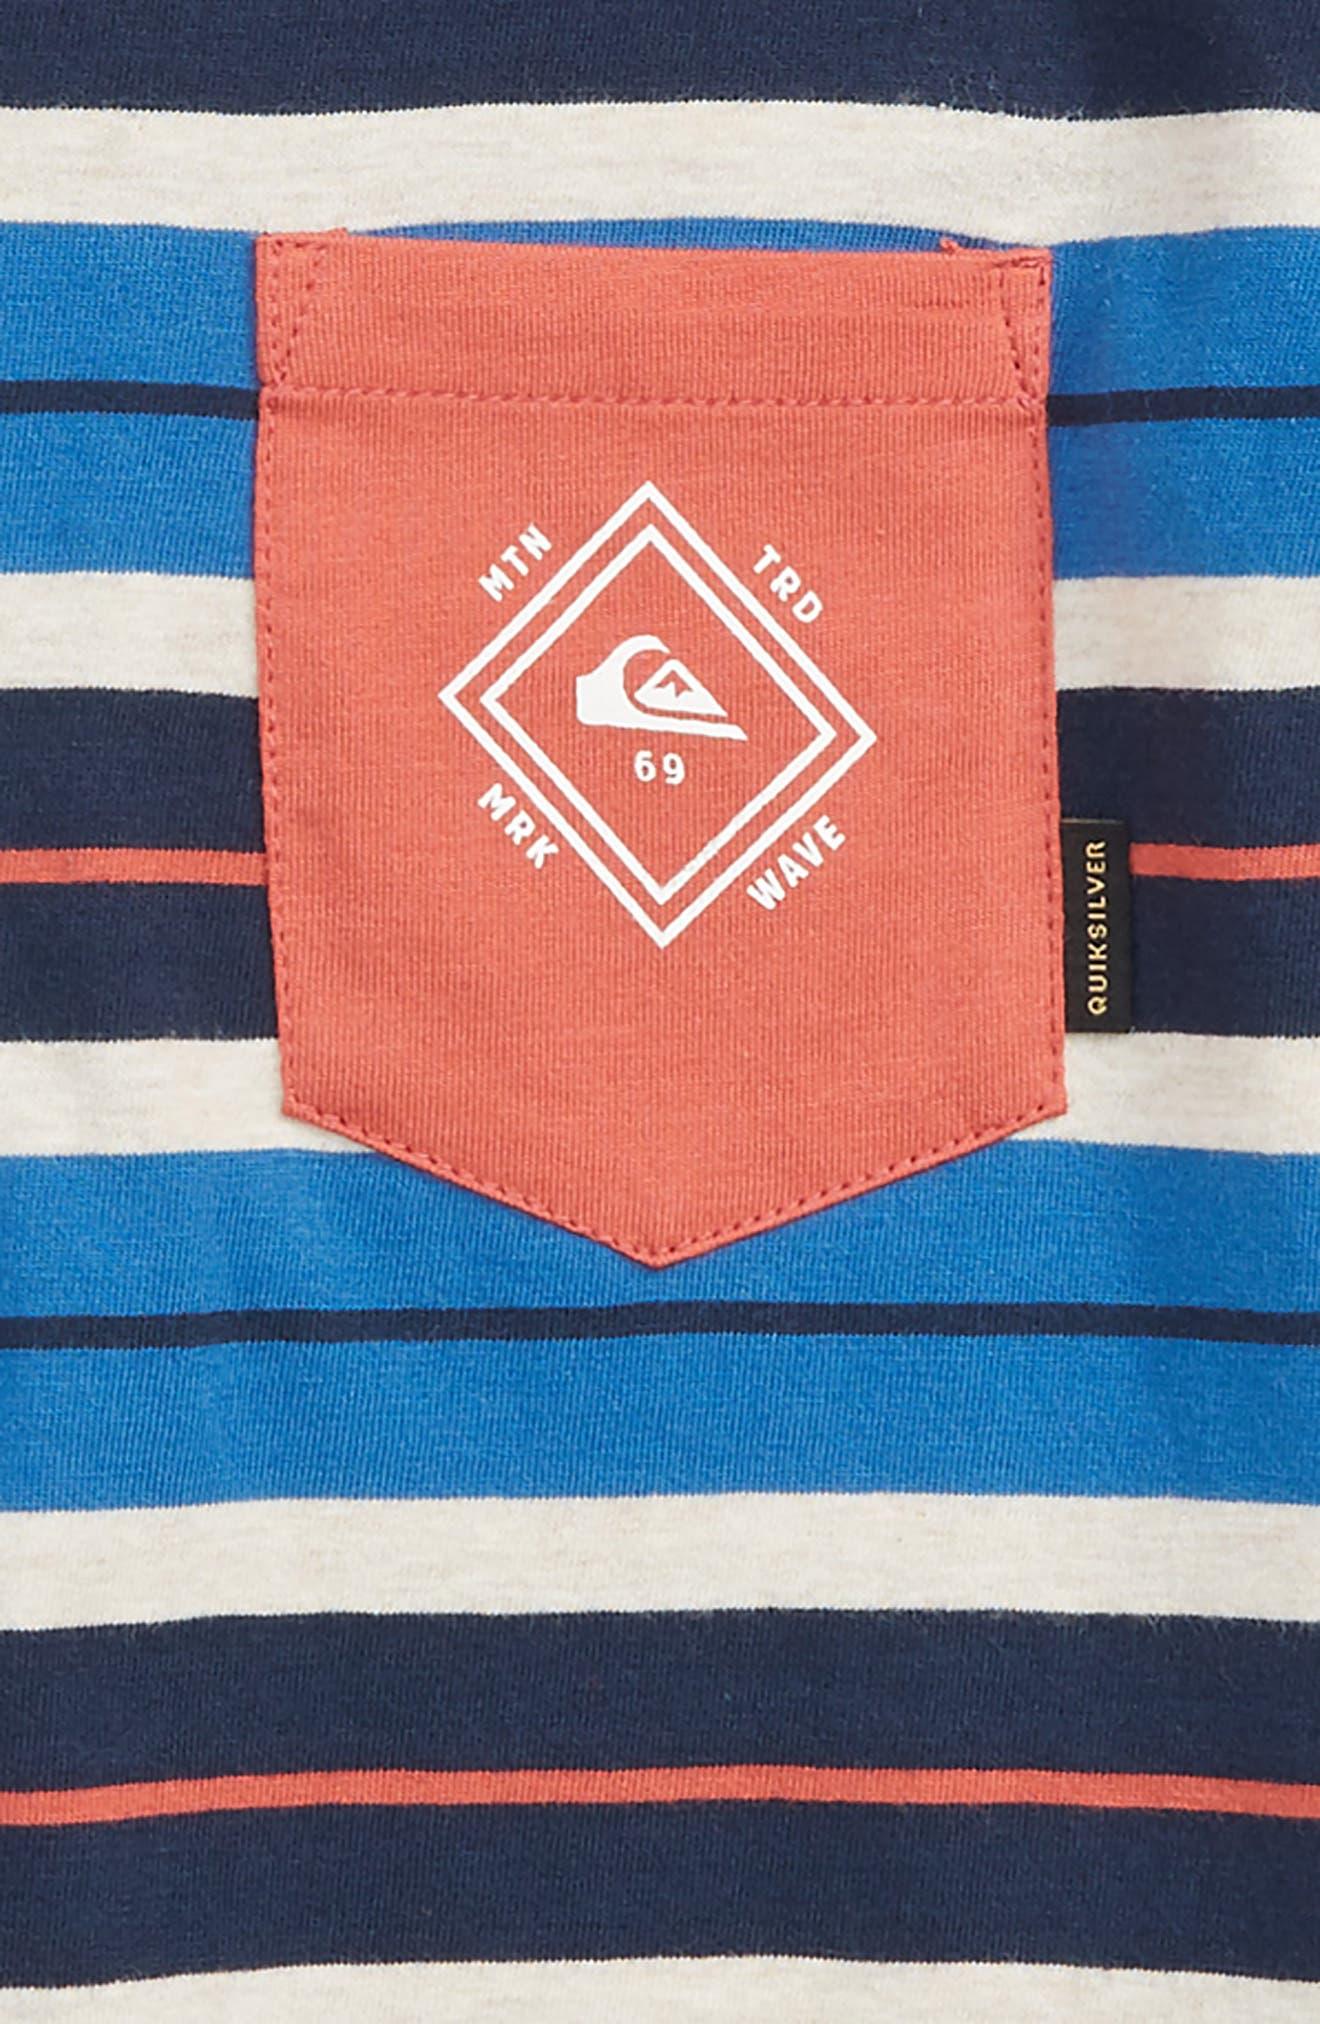 Oloa Stripe Shirt,                             Alternate thumbnail 2, color,                             Bright Cobalt